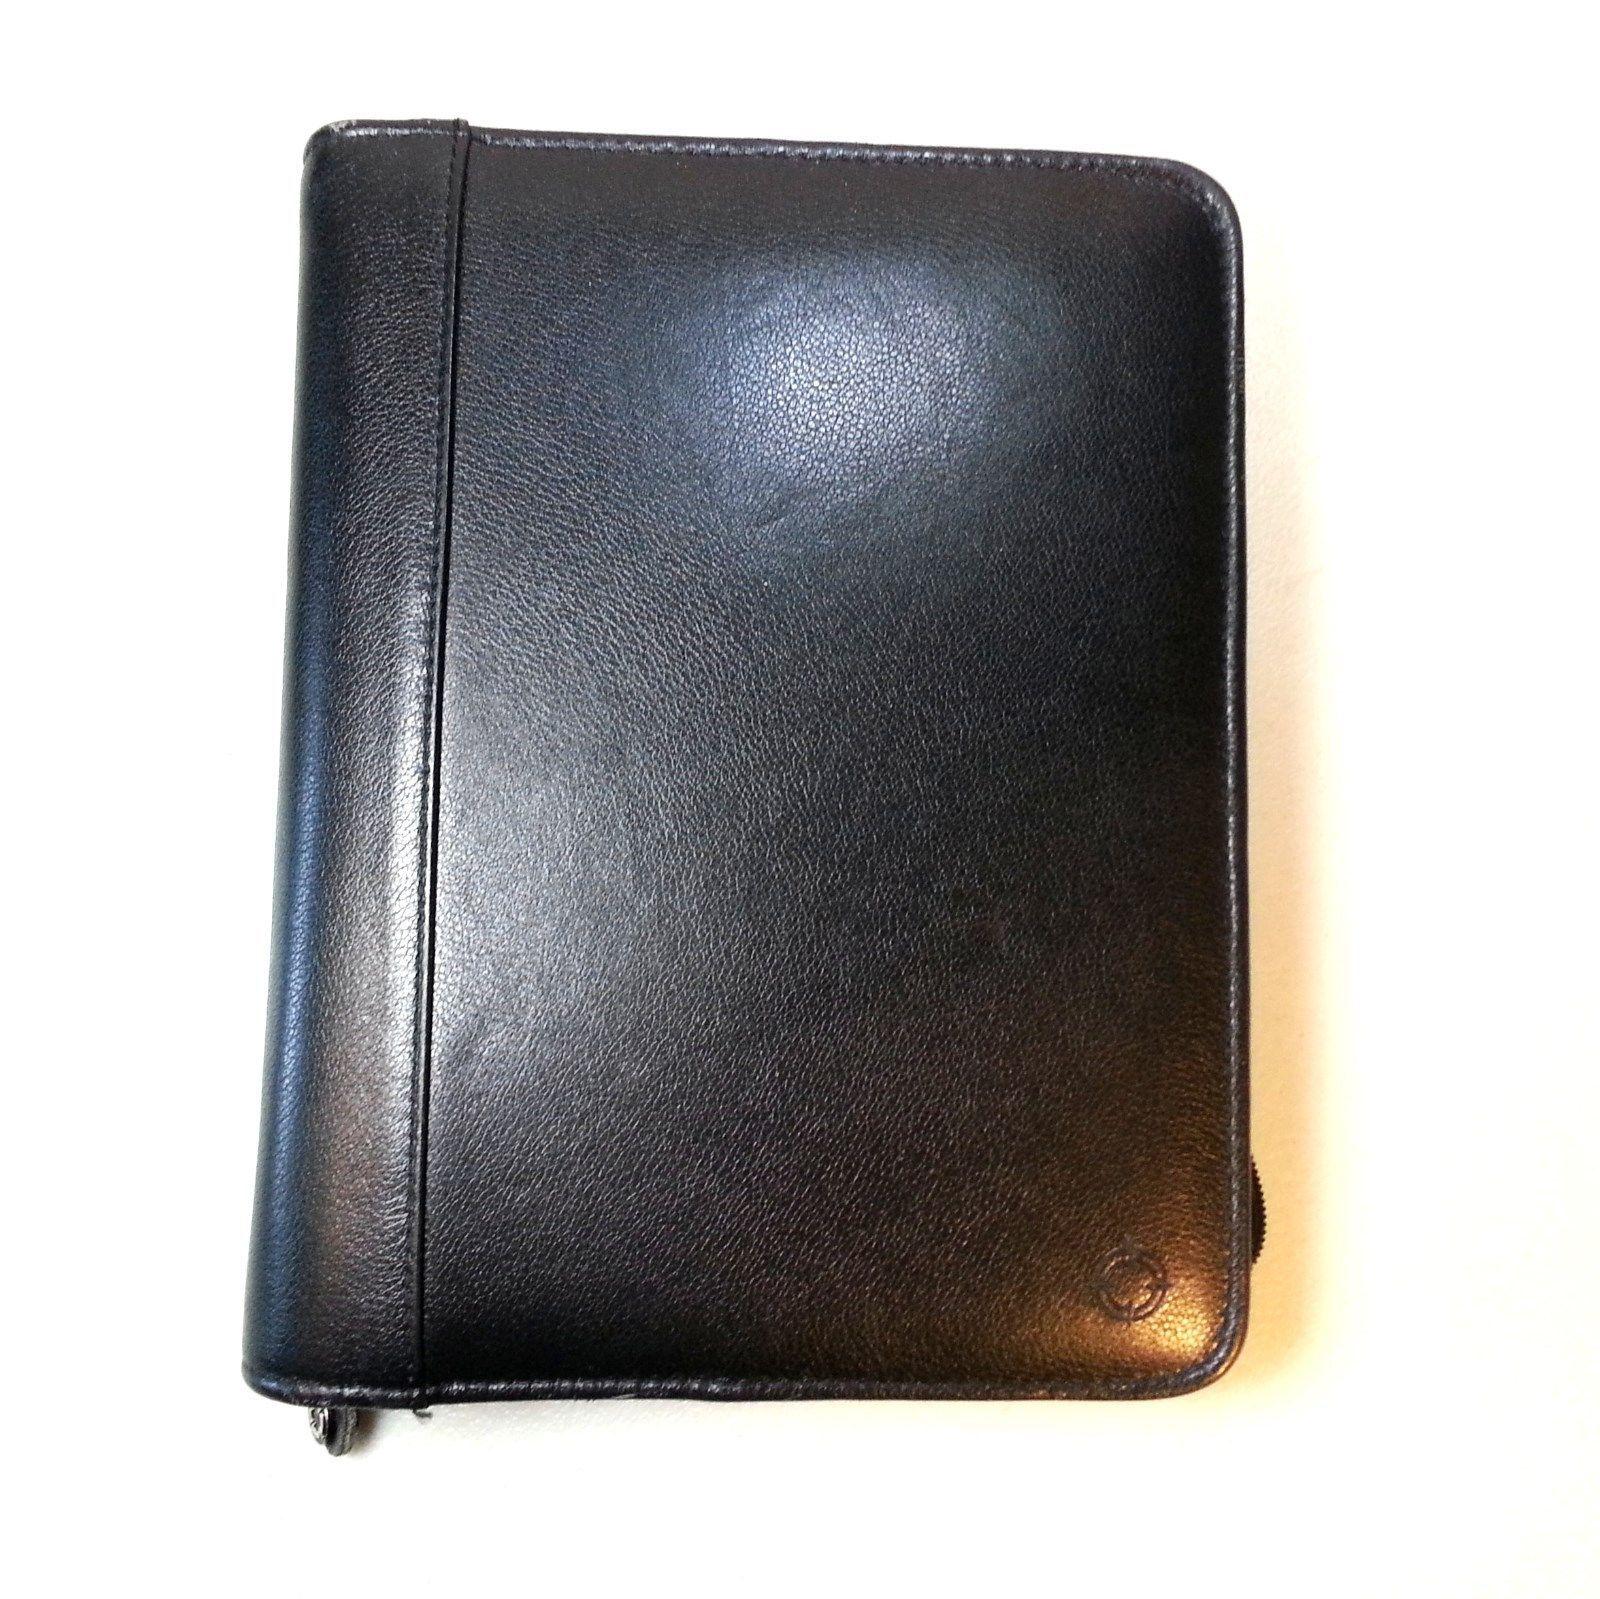 Franklin Covey Top Grain Black Leather Binder Planner